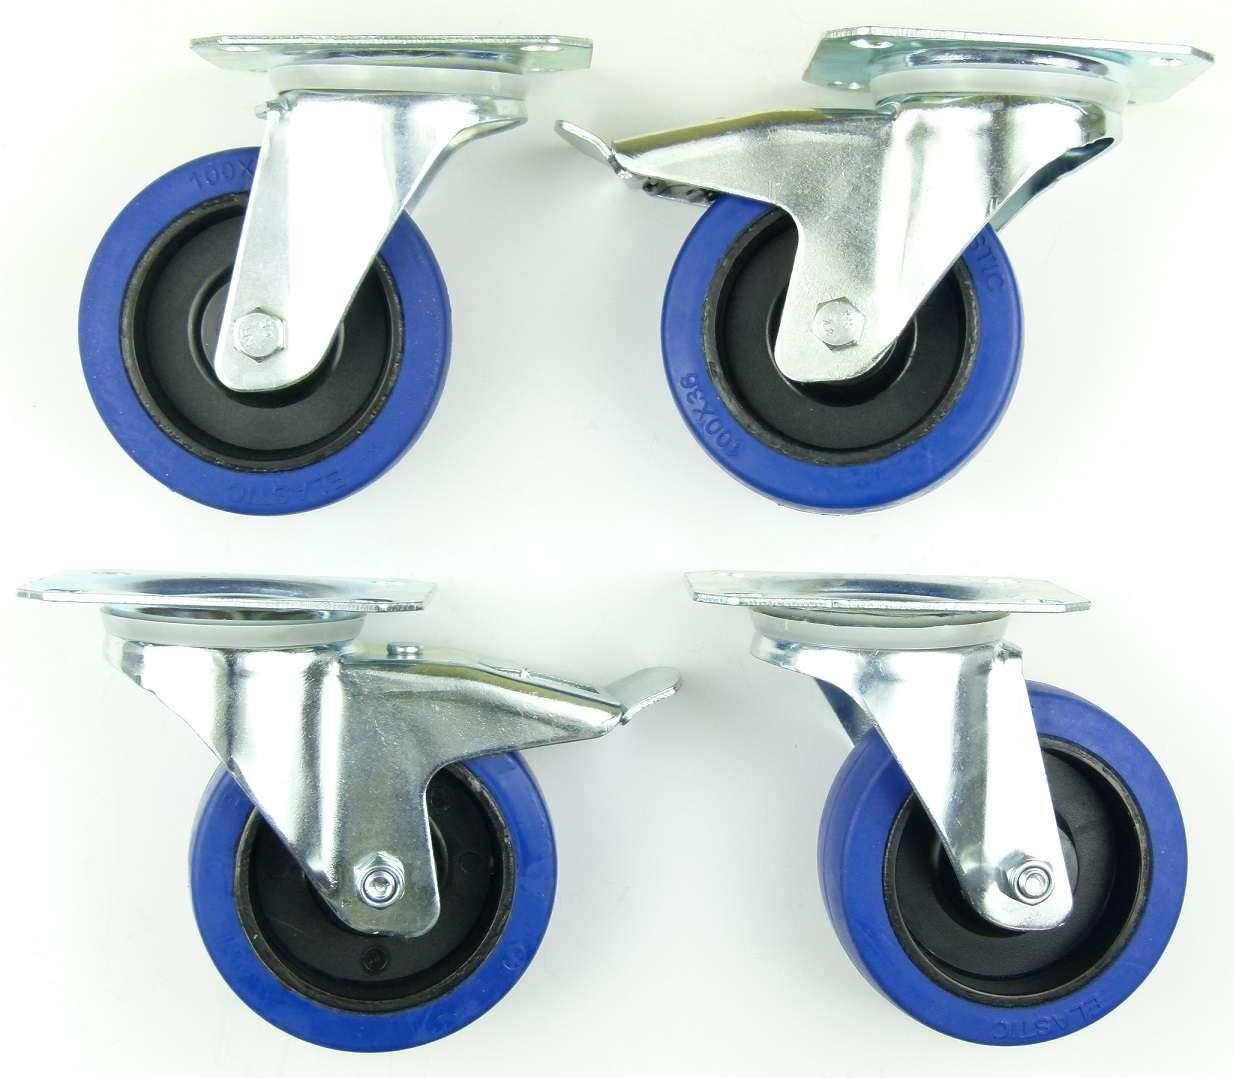 Bockrollen BLUE WHEELS Transportrollen 2 Set SL 125 mm Lenkrollen mit Bremse